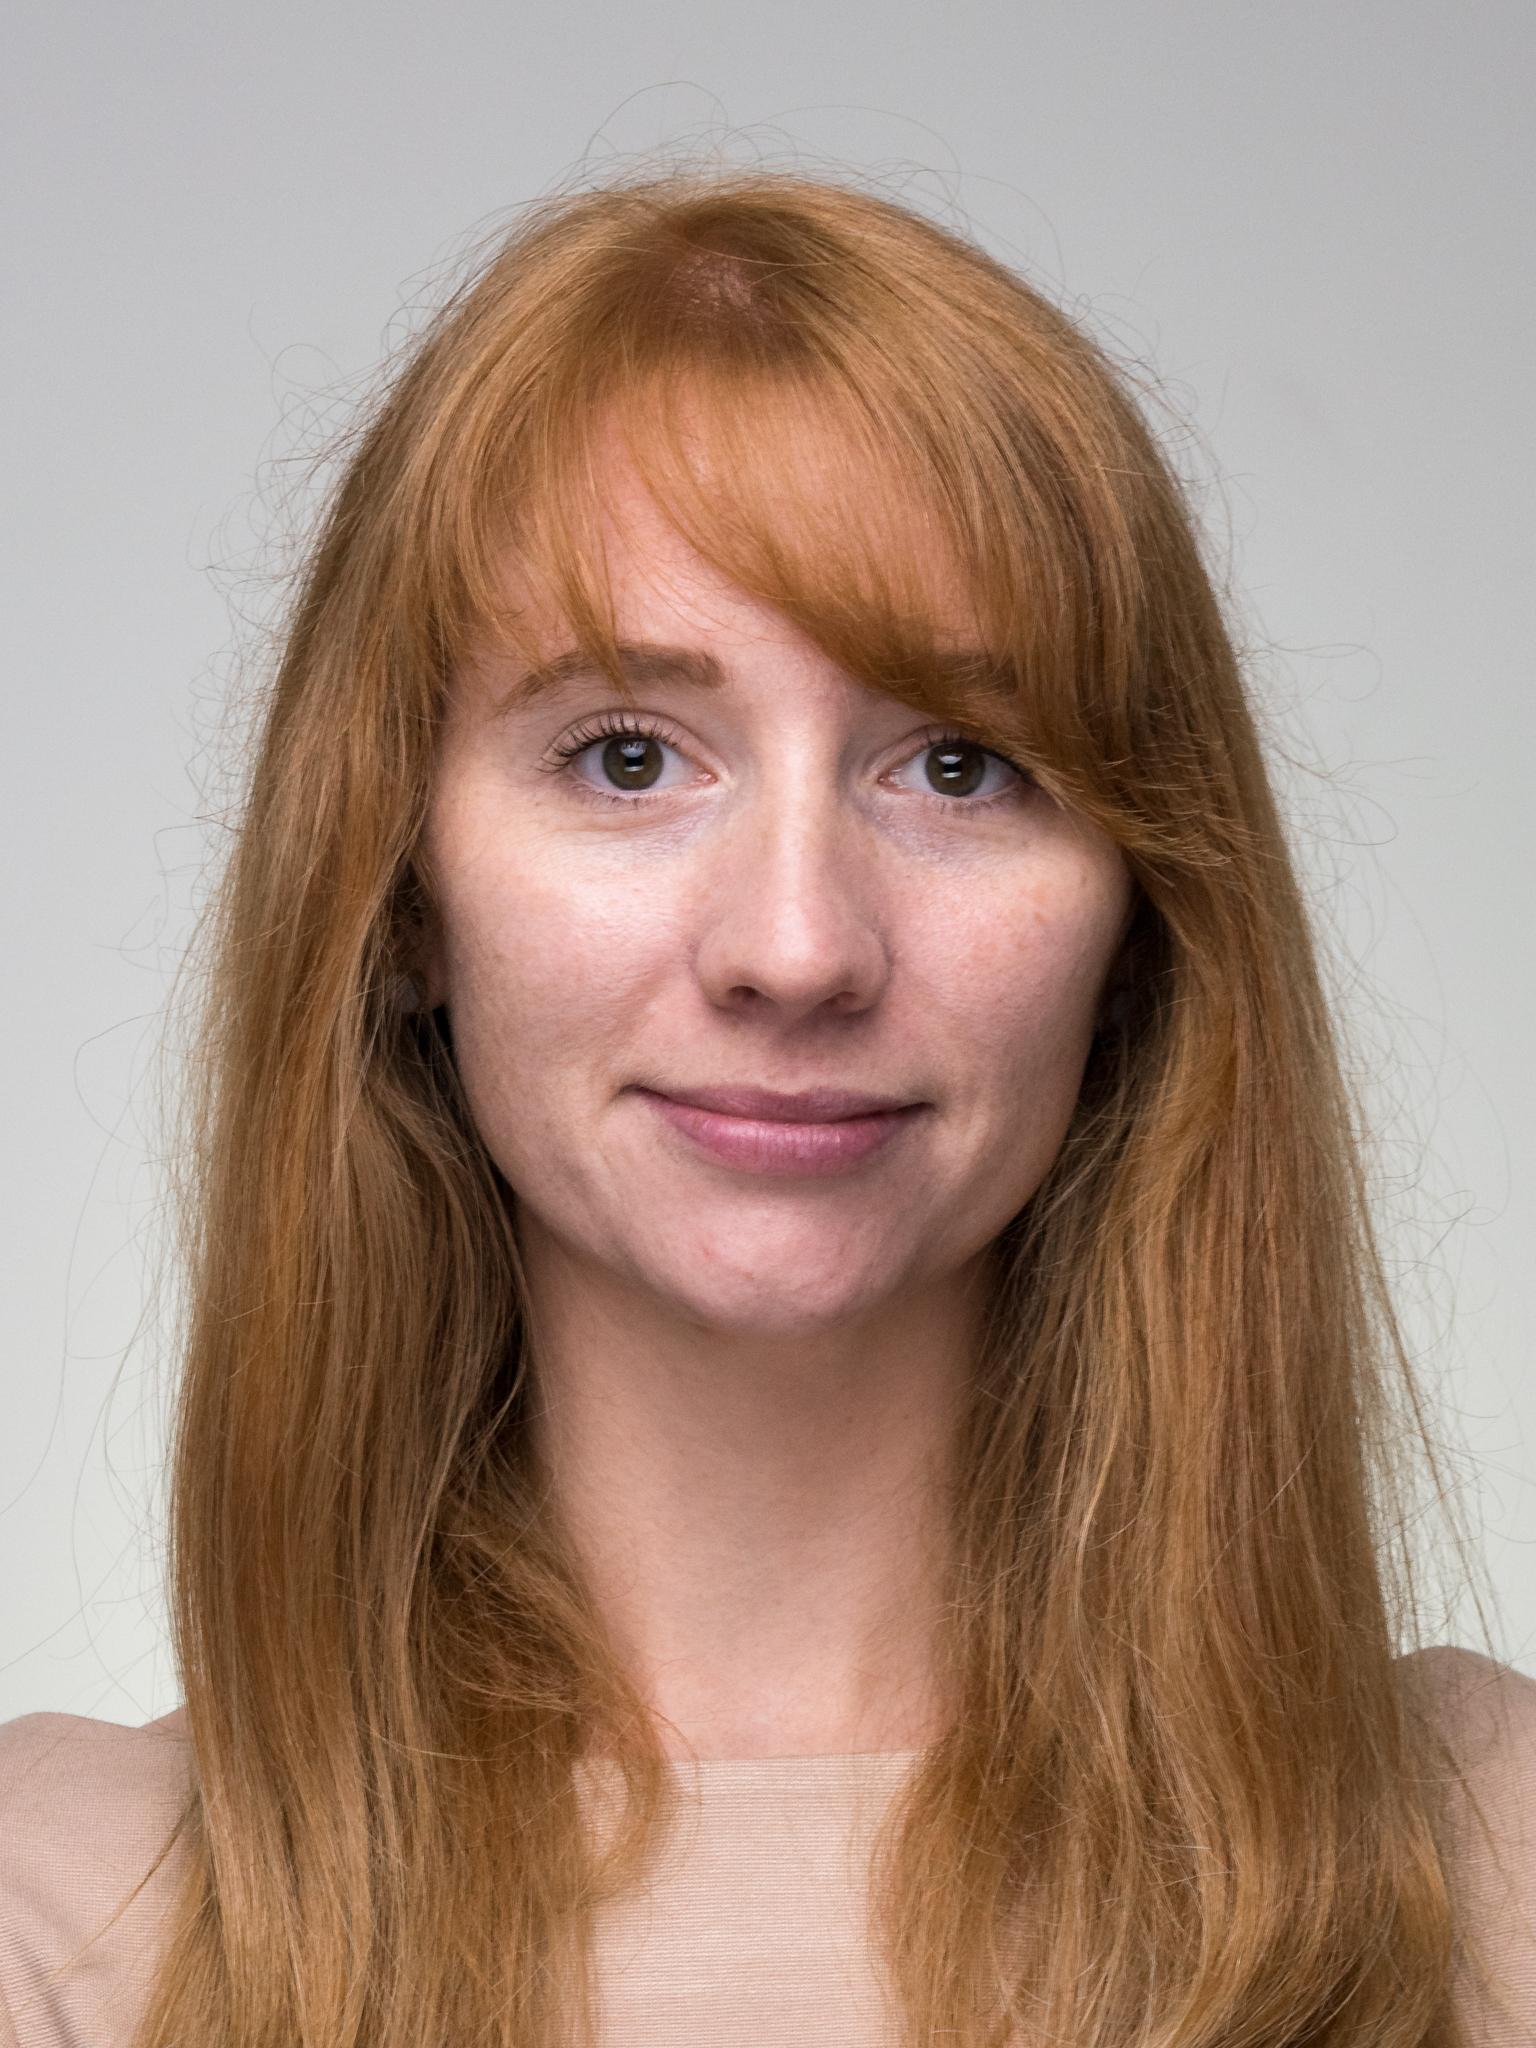 Megan Carder